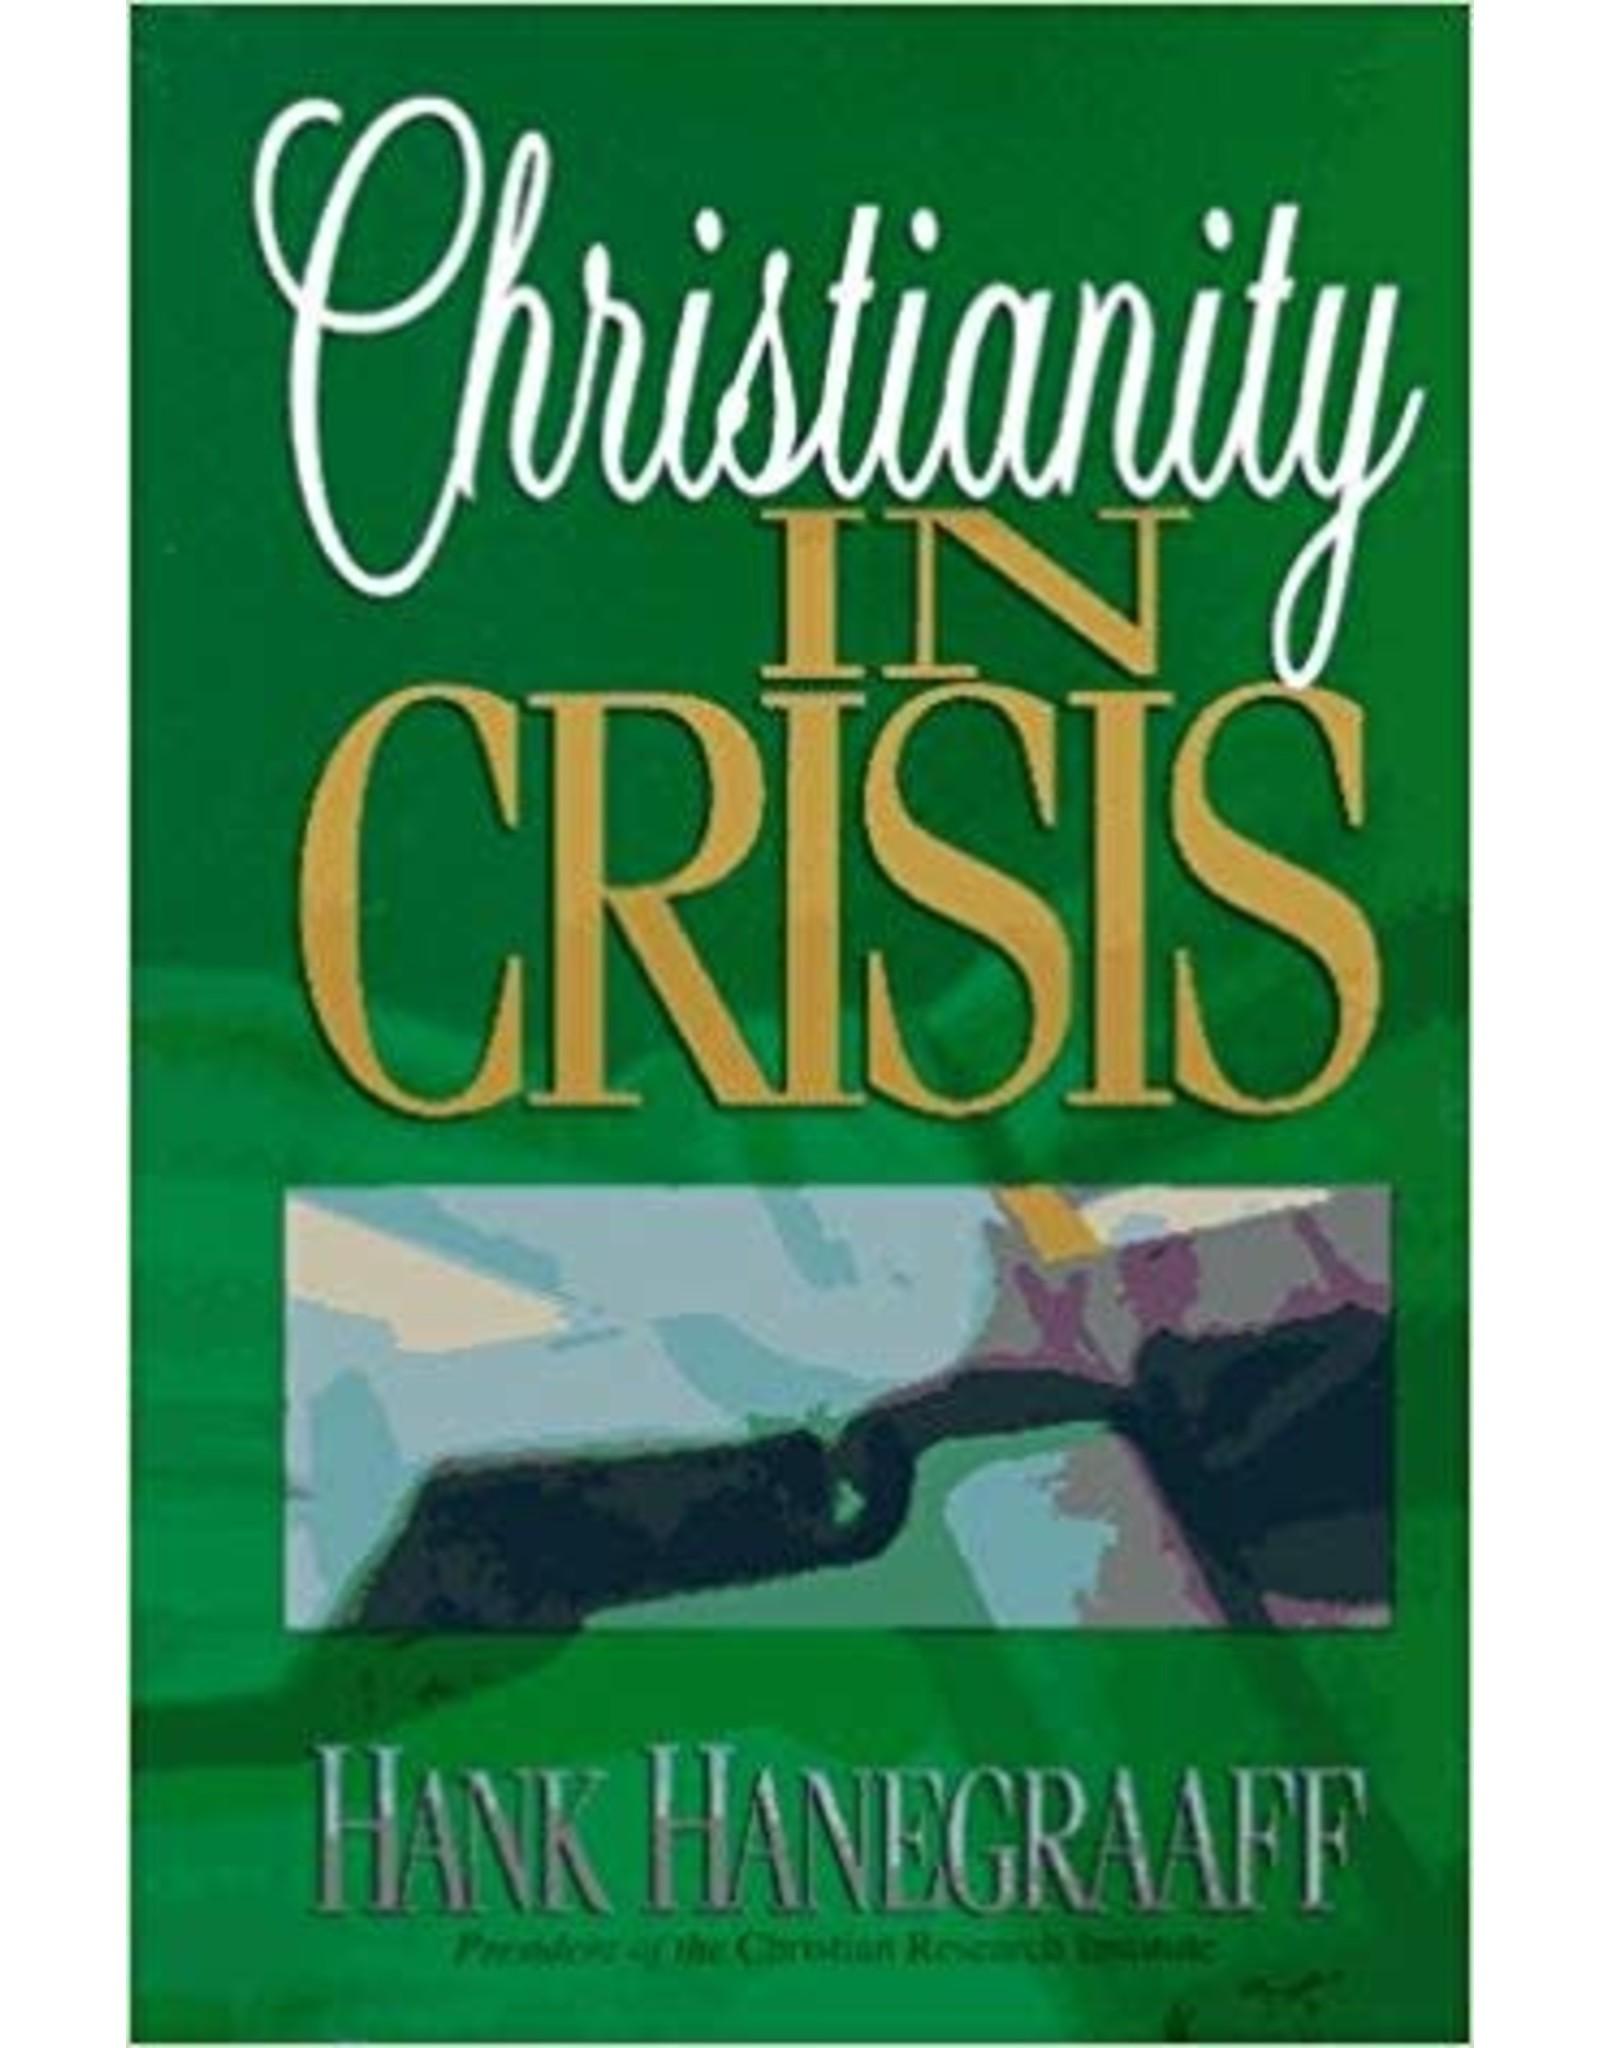 Hanegraaf Christianity in Crisis